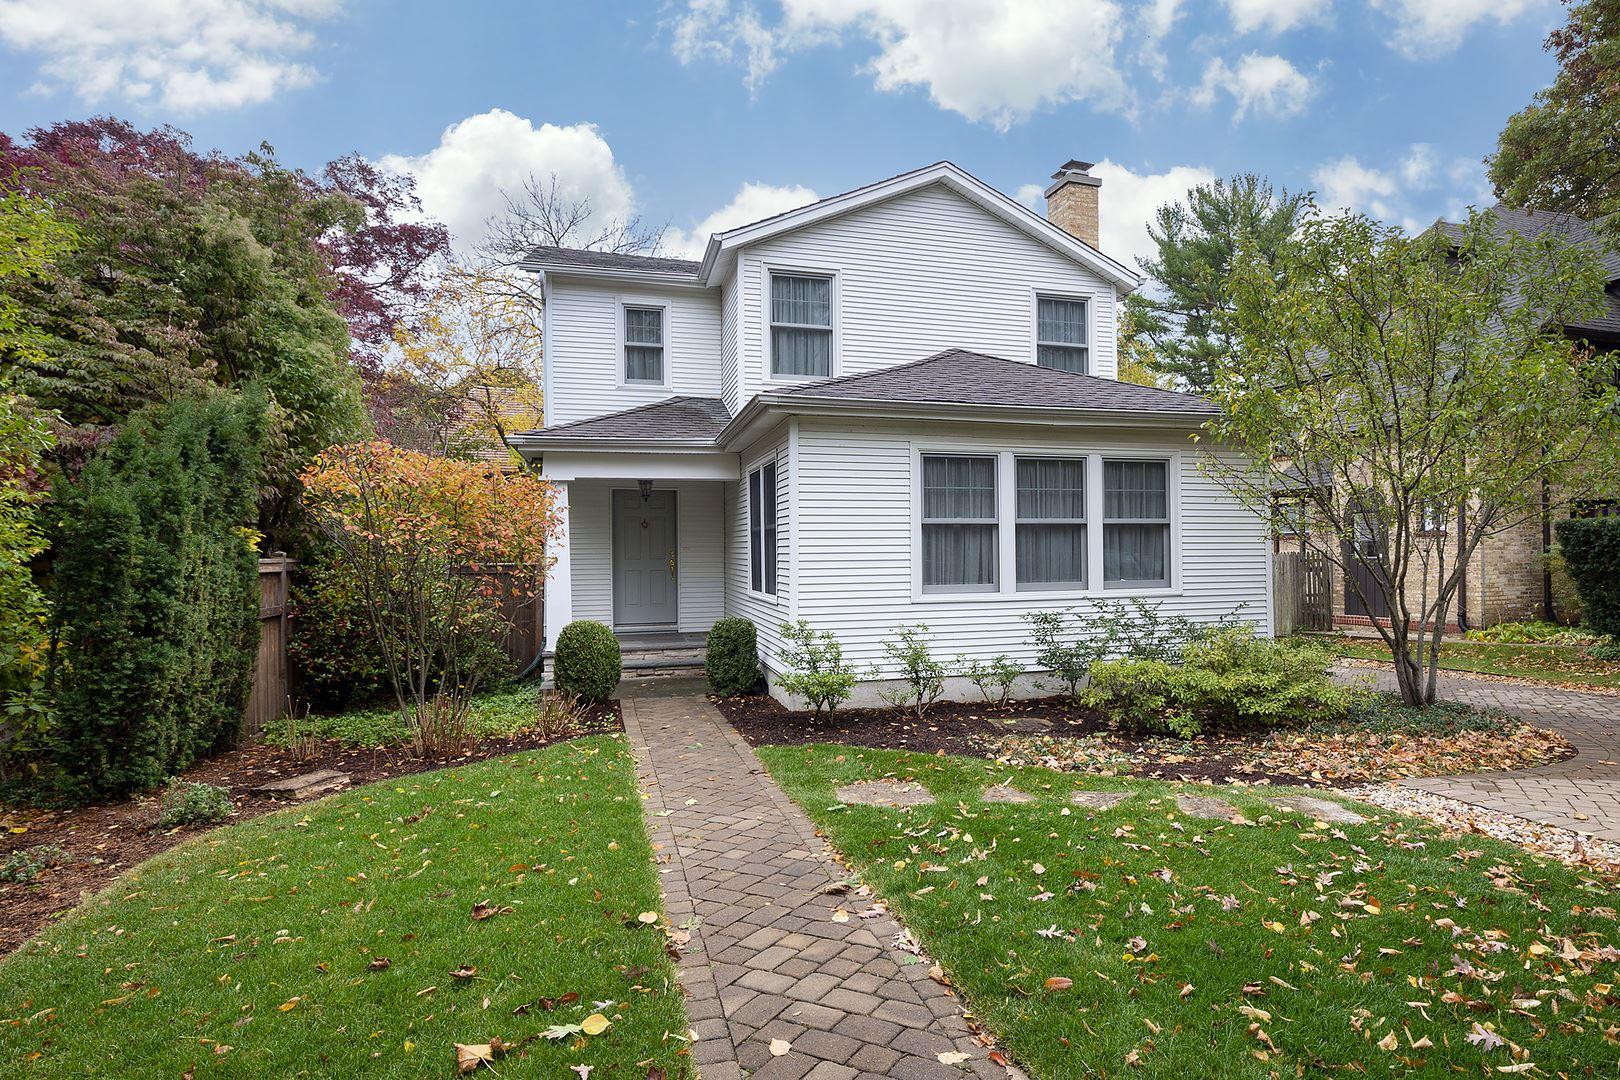 Photo for 2759 Ridge Avenue, Evanston, IL 60201 (MLS # 10921214)